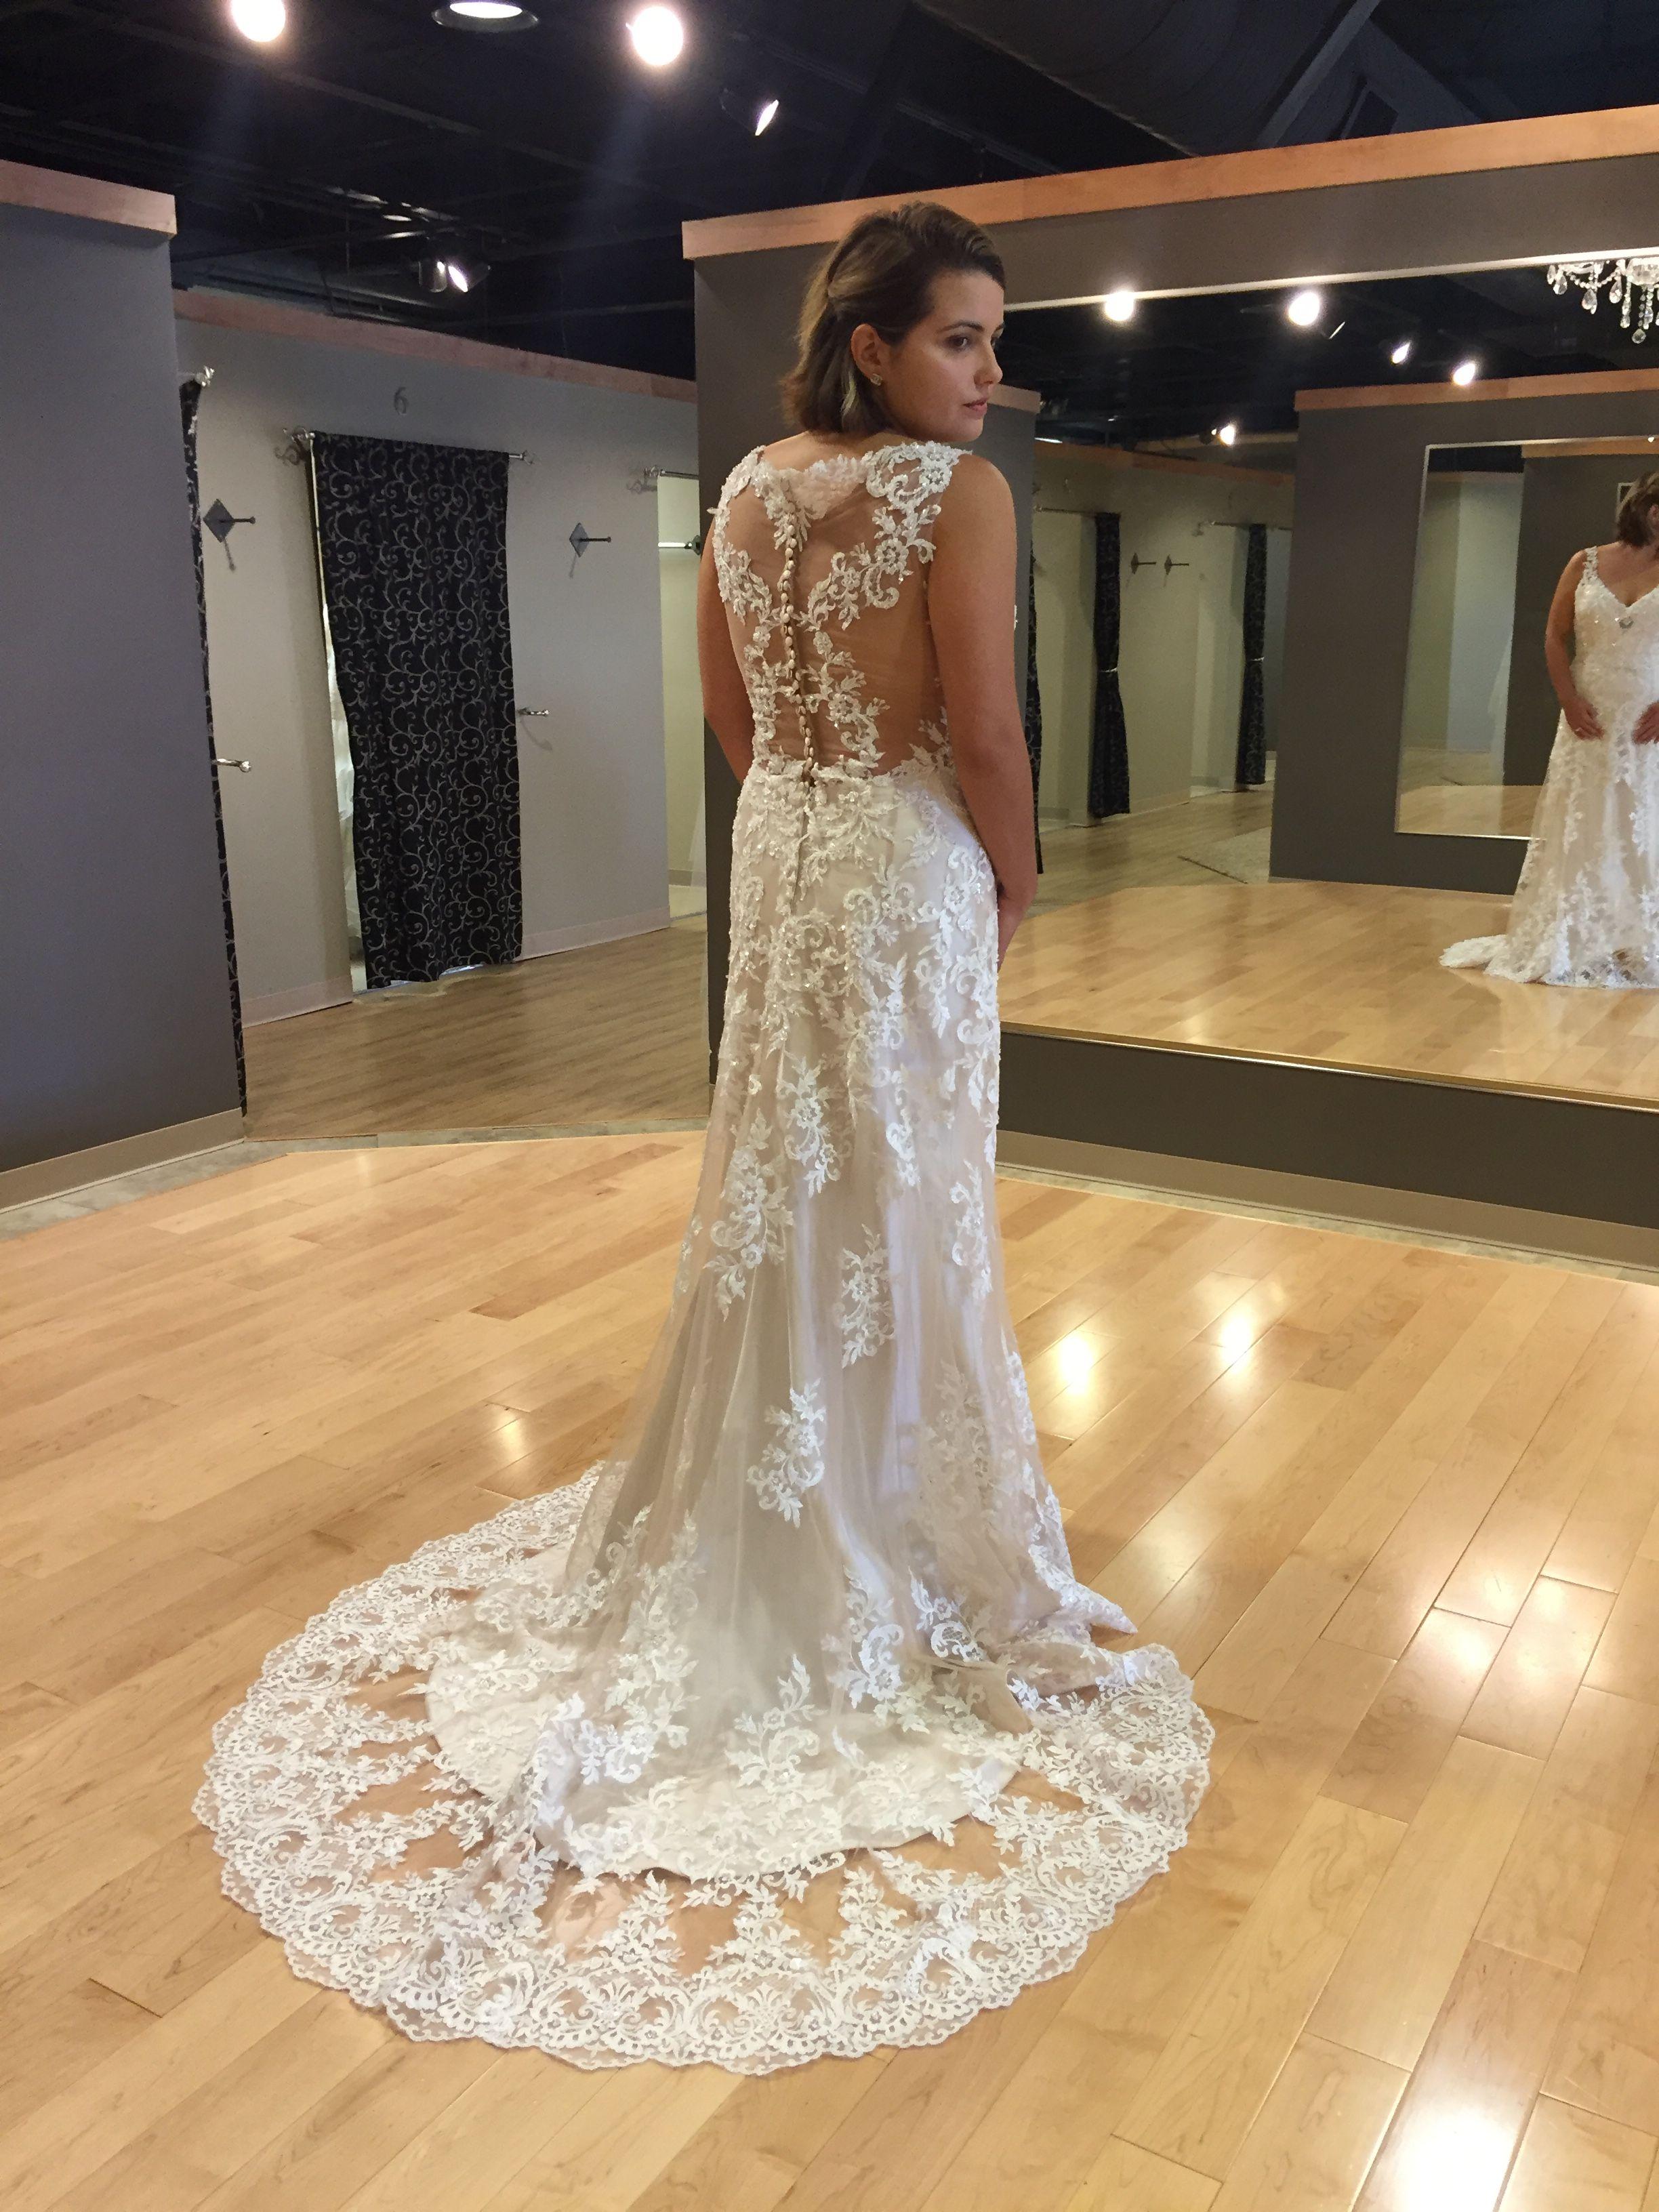 Preloved pronovias wedding dresses  Pin by Brigitte Baker on Wedding inspiration  Pinterest  Wedding